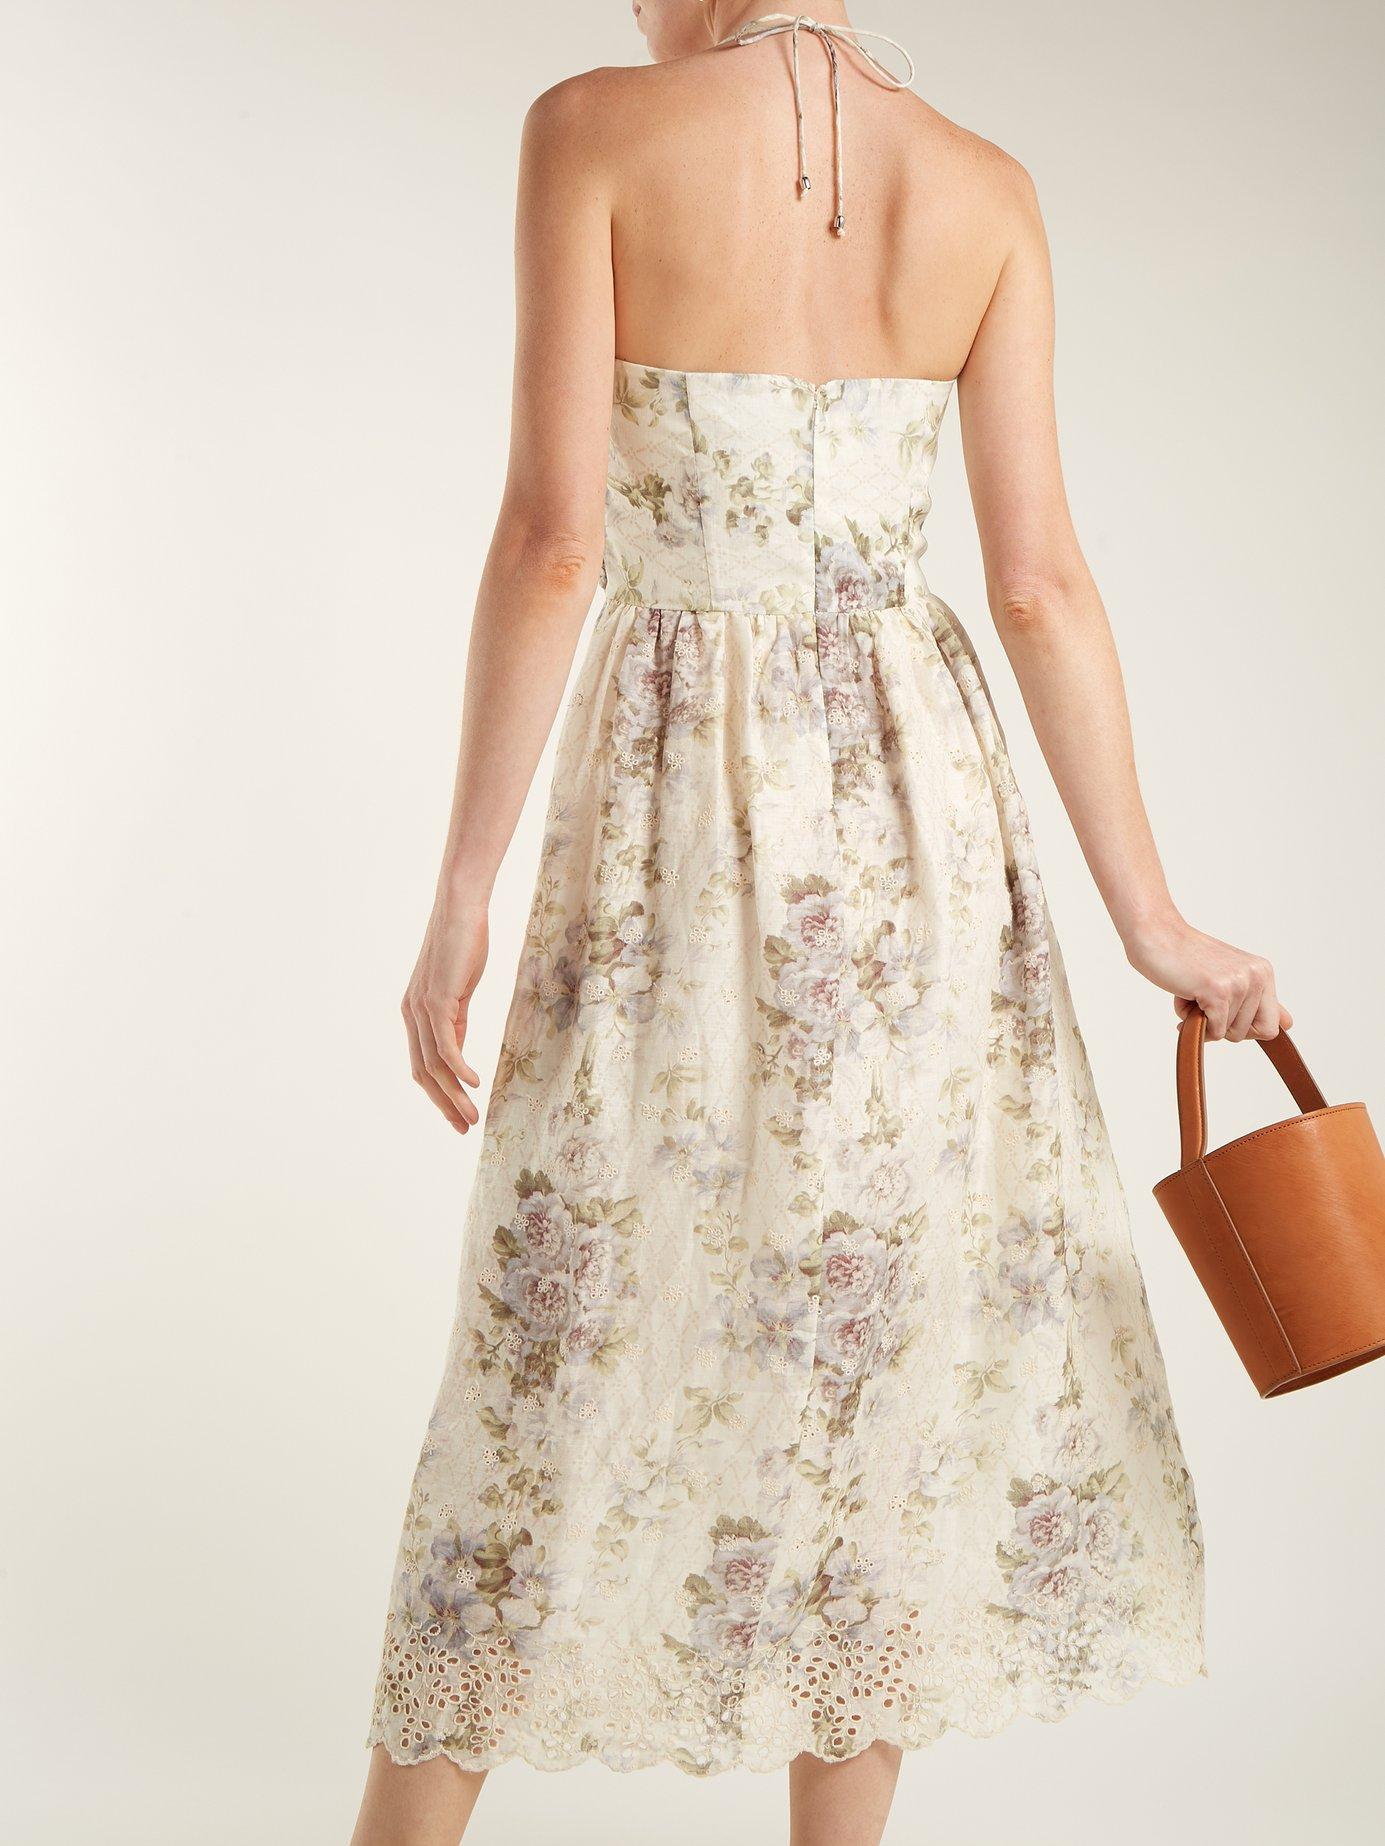 Iris Picnic floral-print linen dress by Zimmermann